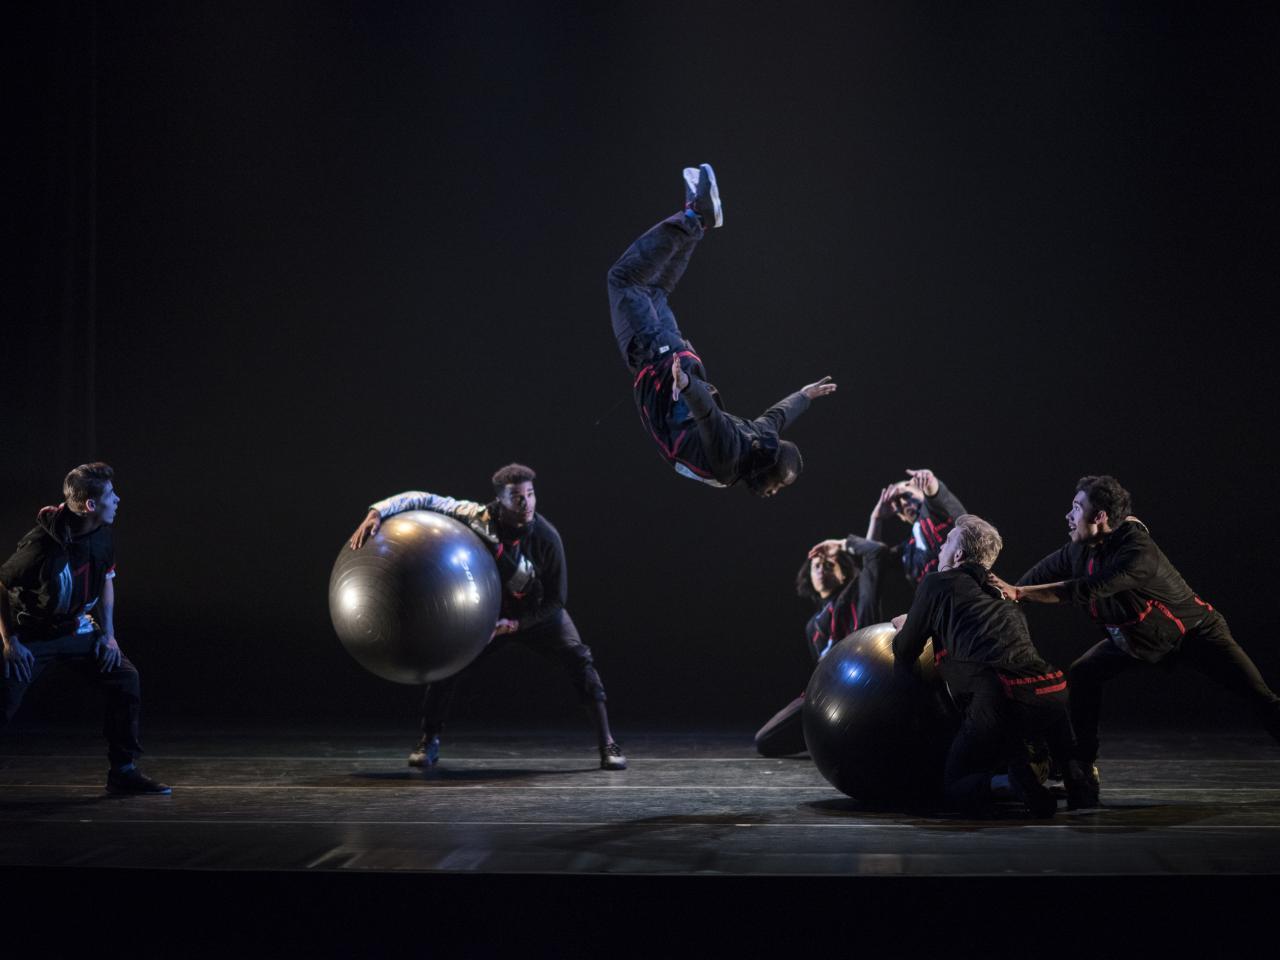 Breakdancecrew the Ruggeds